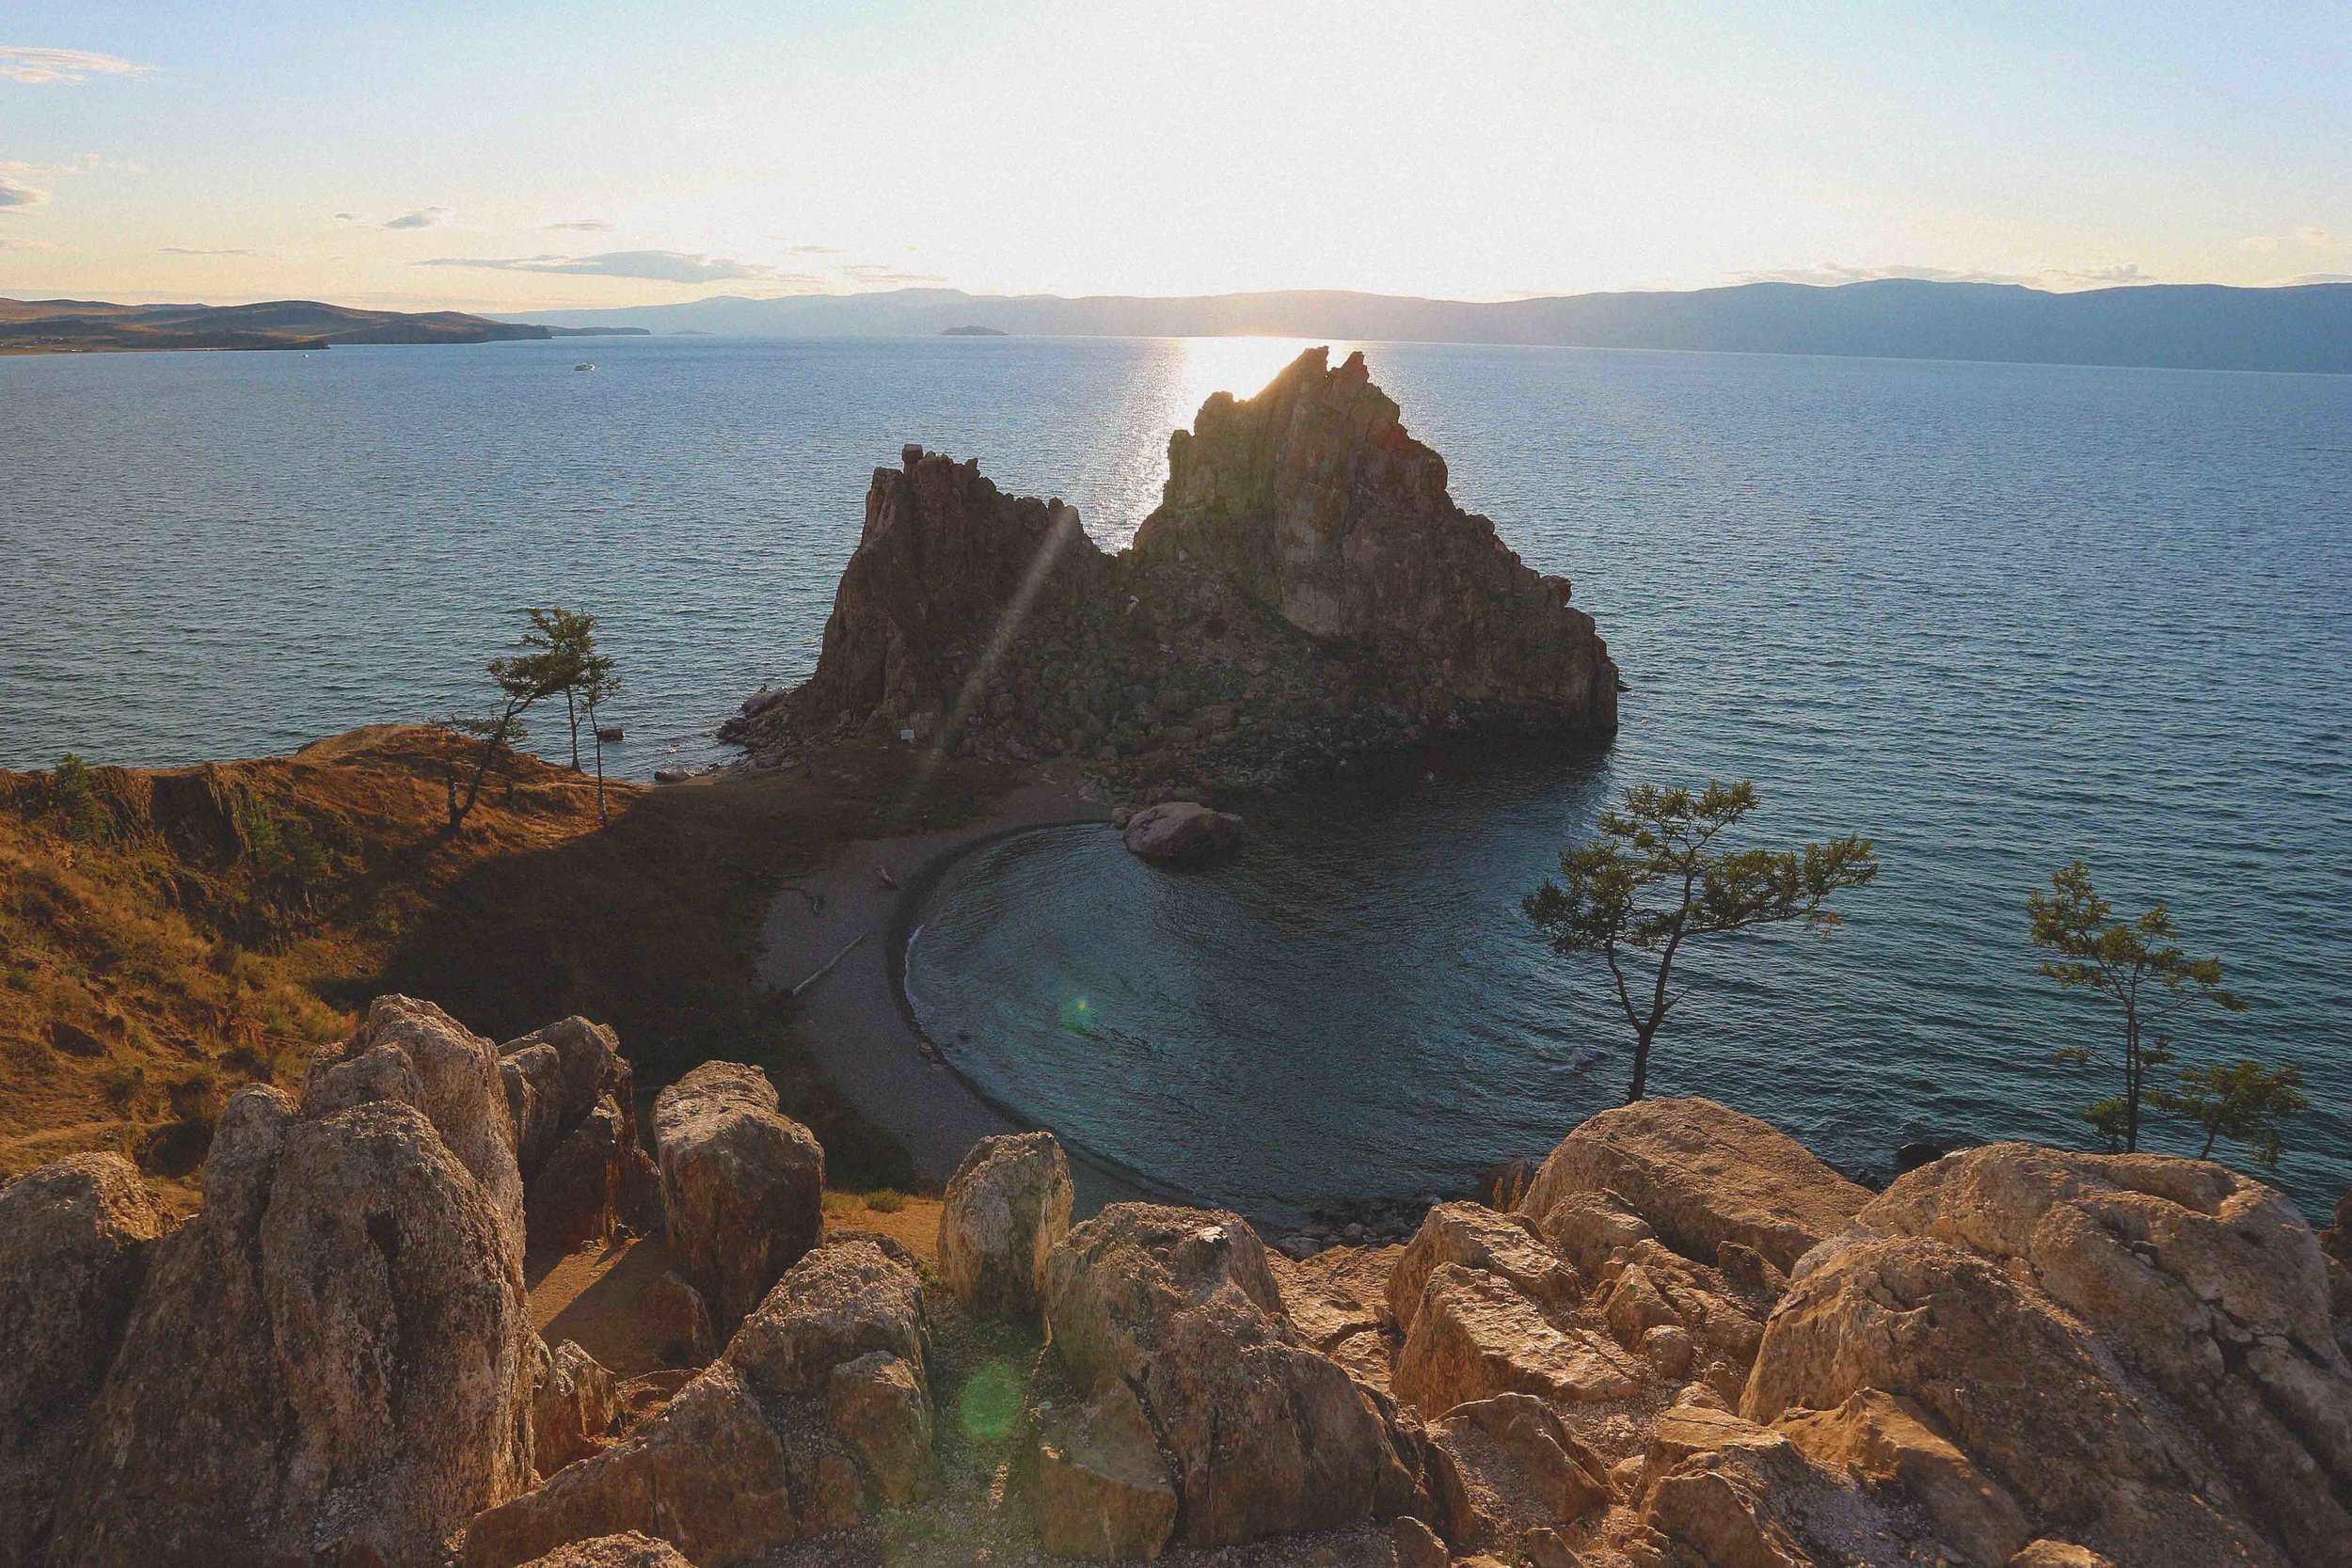 Shamanic rock on Lake Baikal, Siberia, Russia